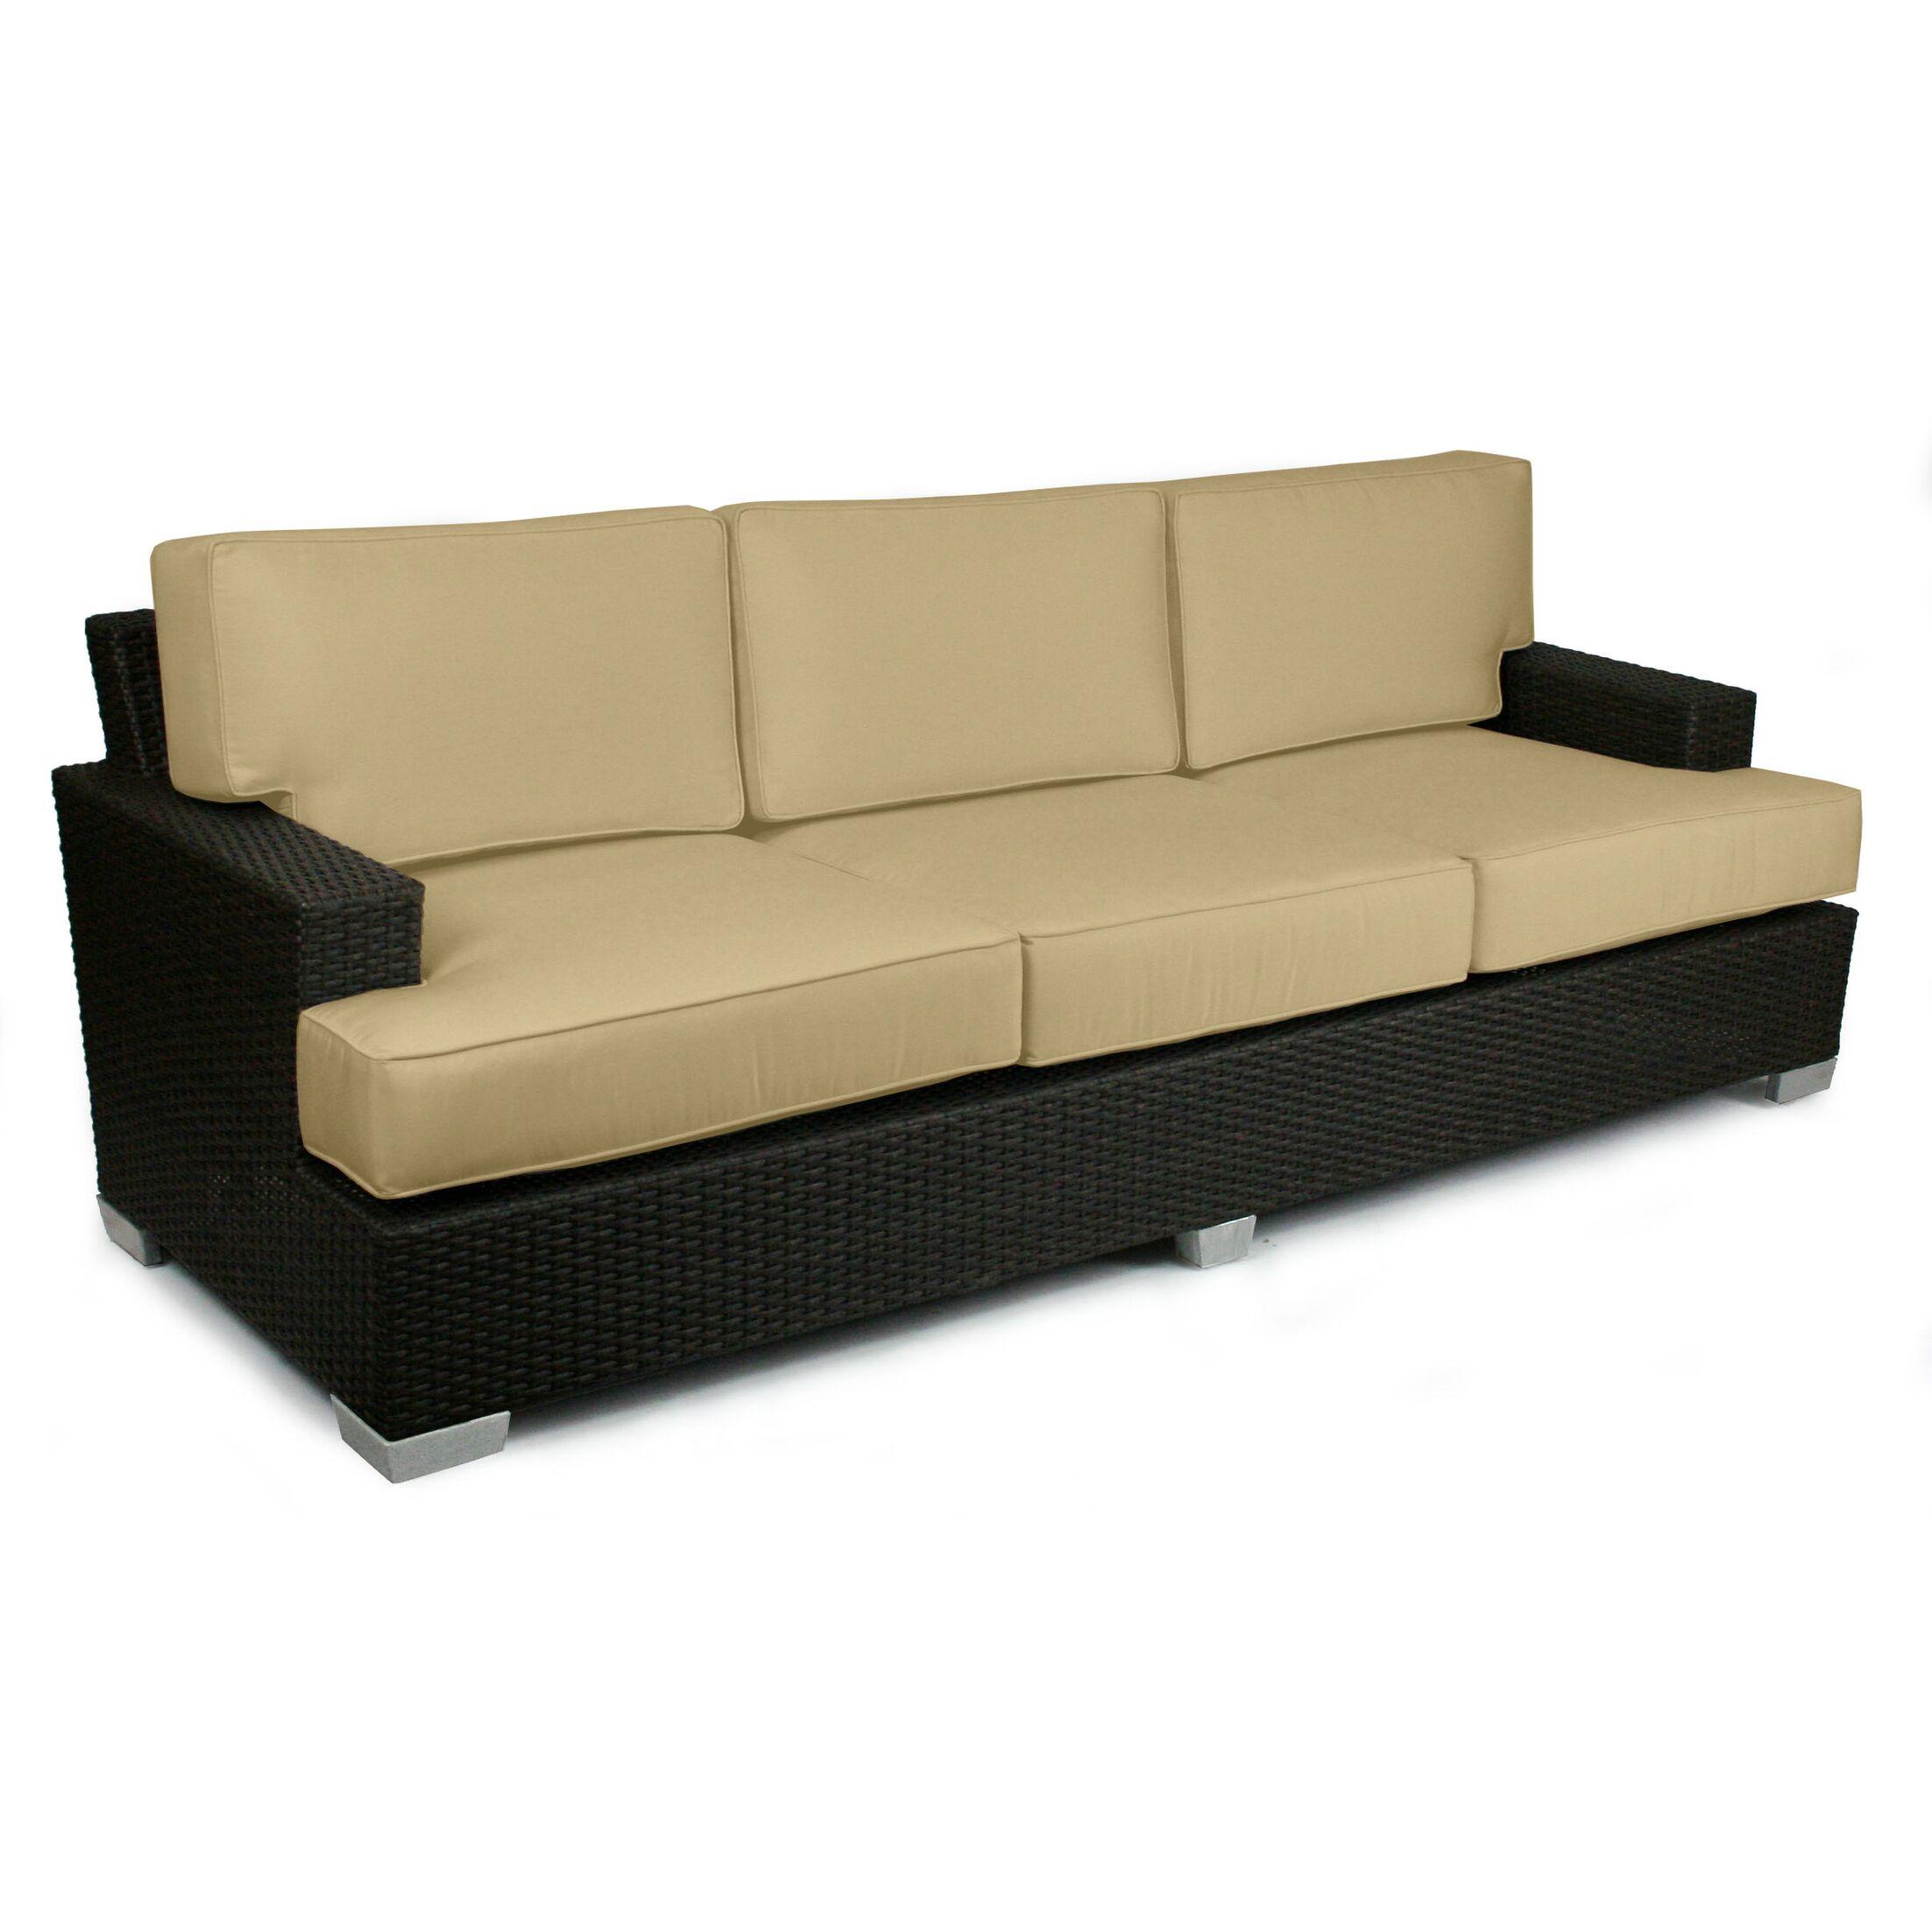 Signature Sofa with Cushions Fabric: Dijon